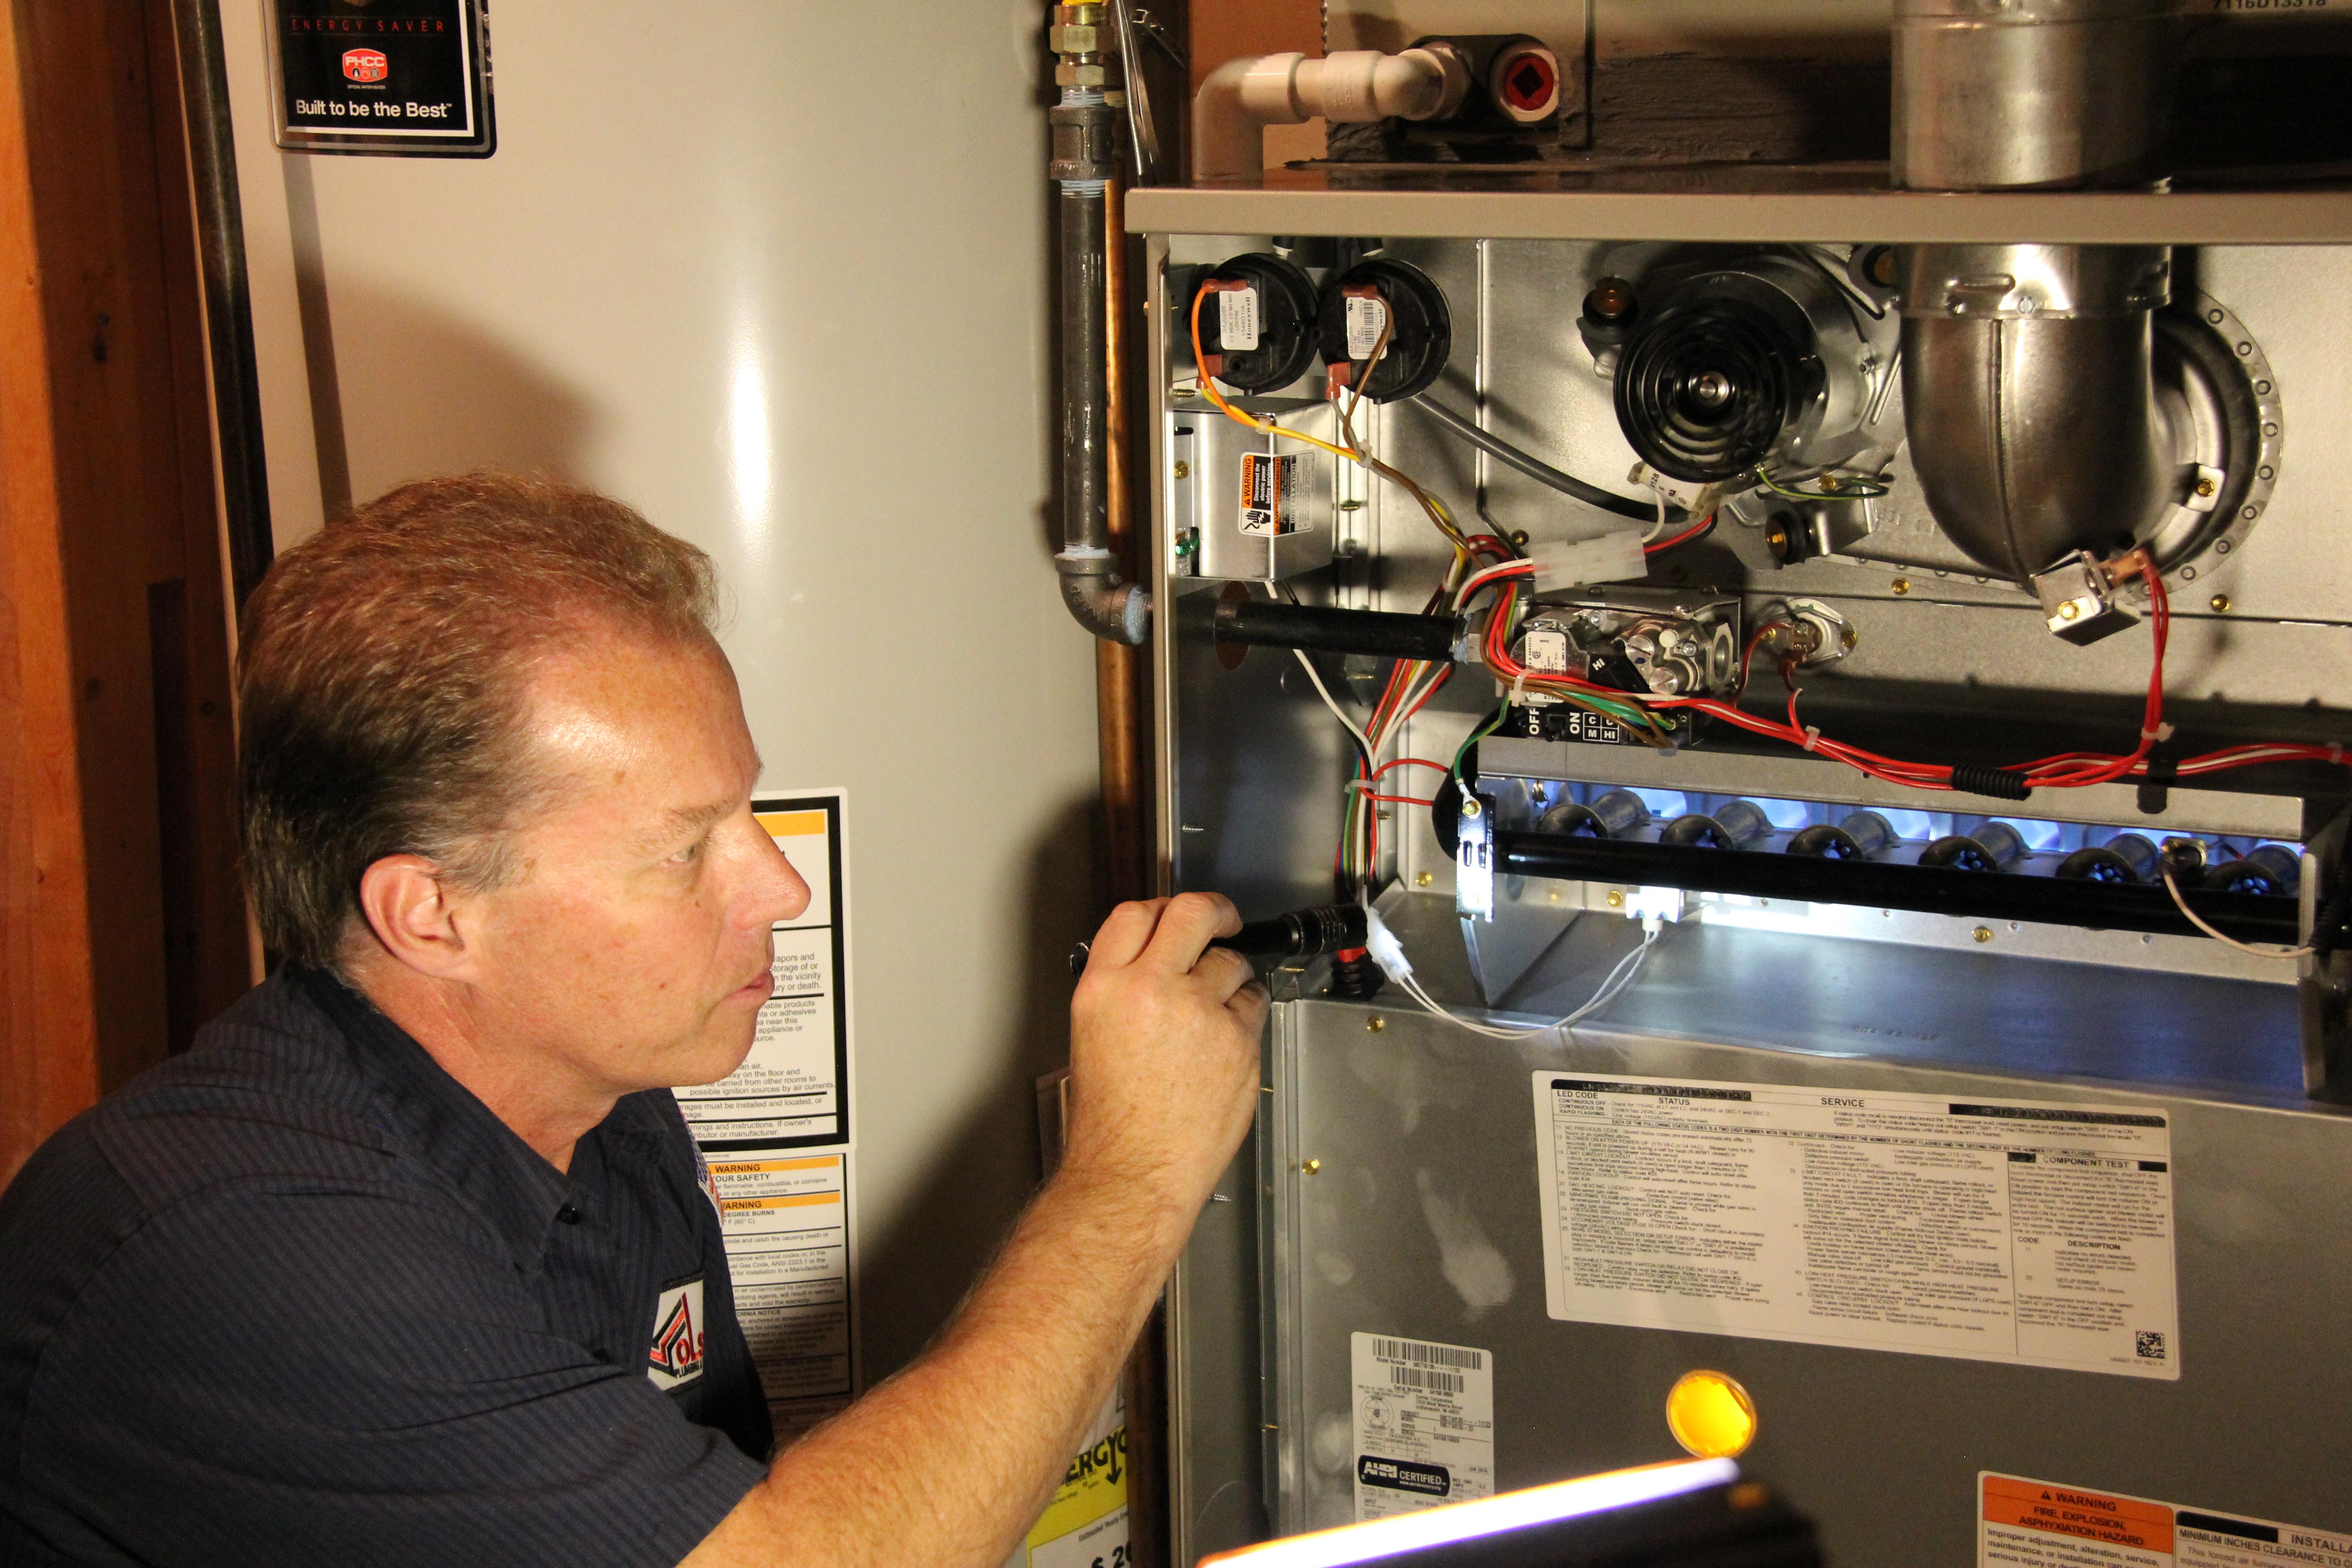 Furnace Inspection – Olson Plumbing & Heating Co